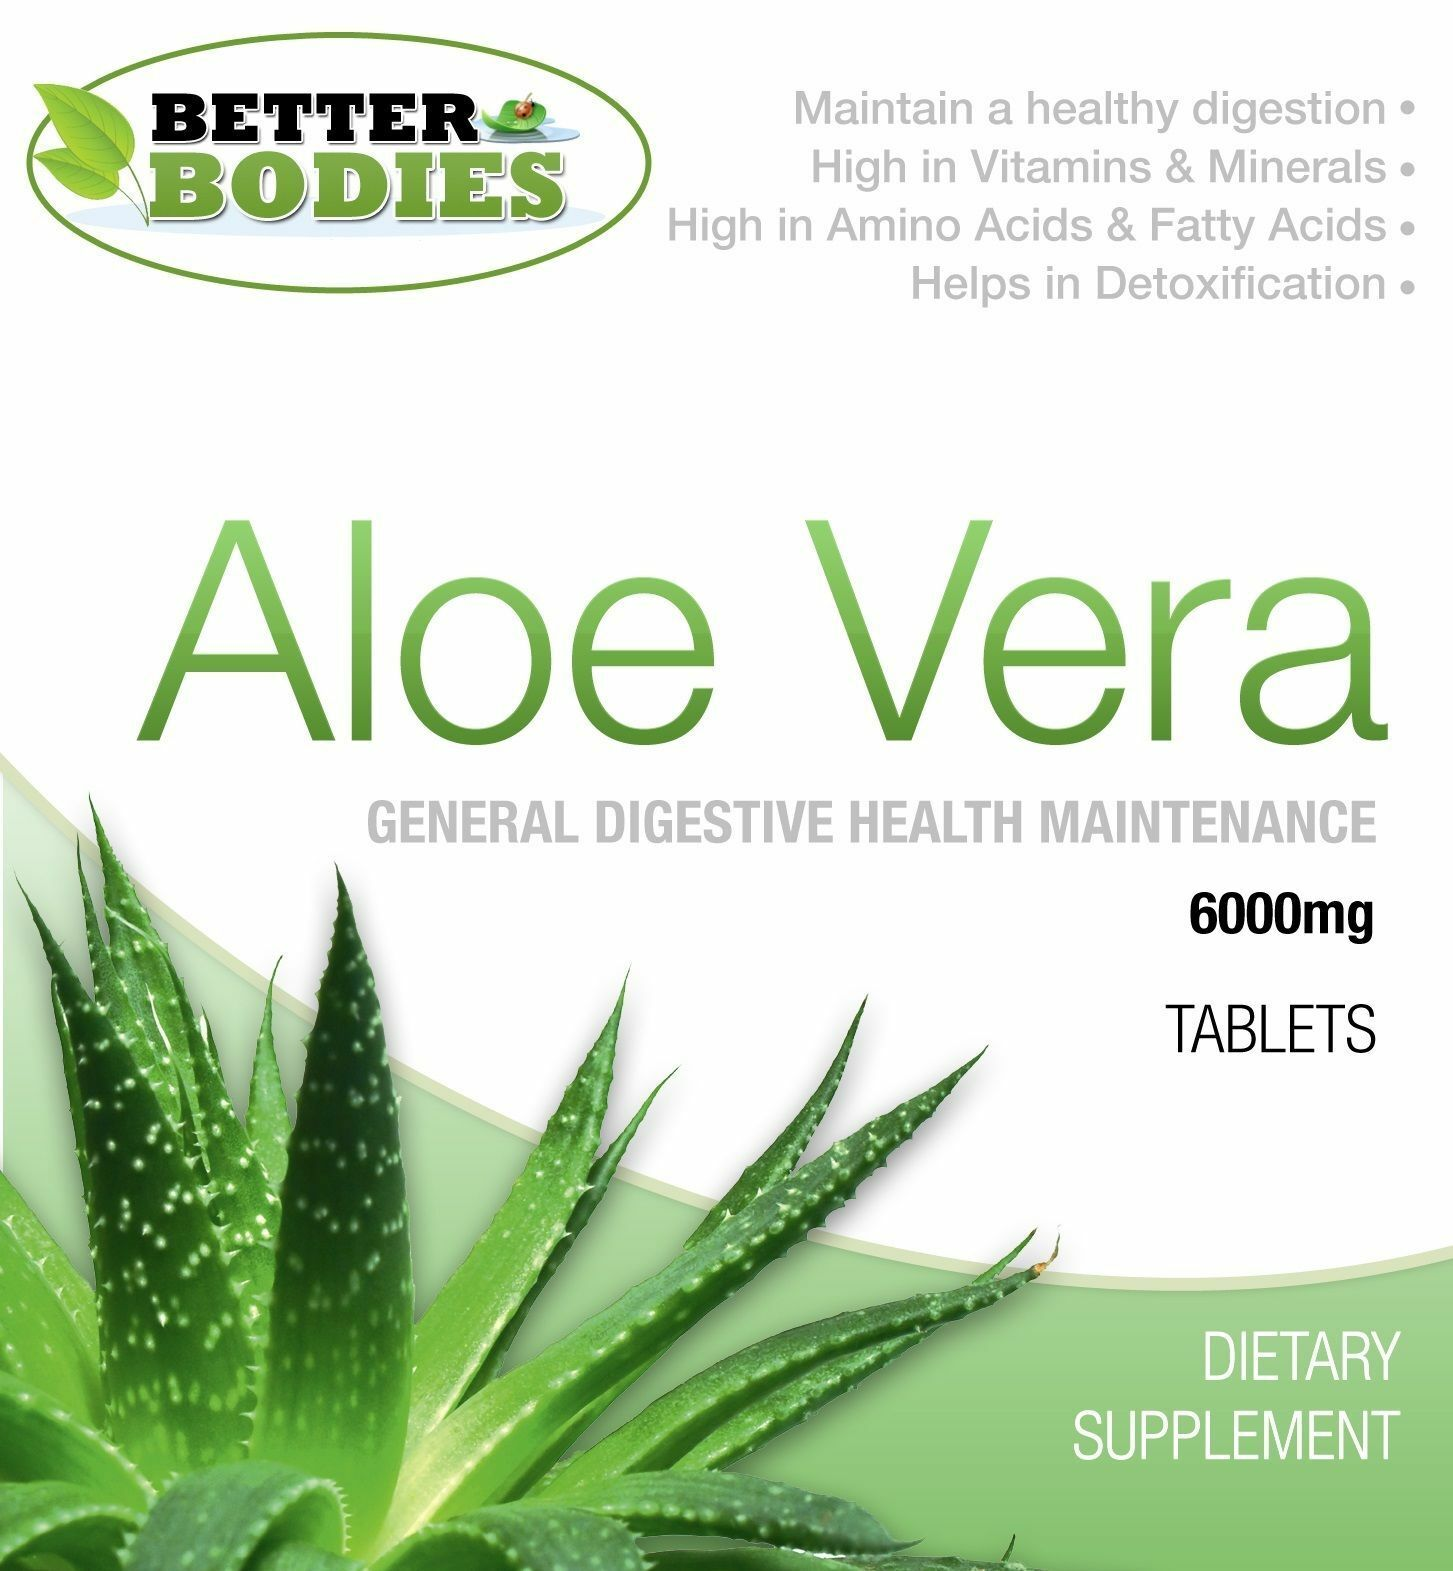 Aloe Vera Saft 6000mg Tabletten SUPPER STARK Darmreinigung